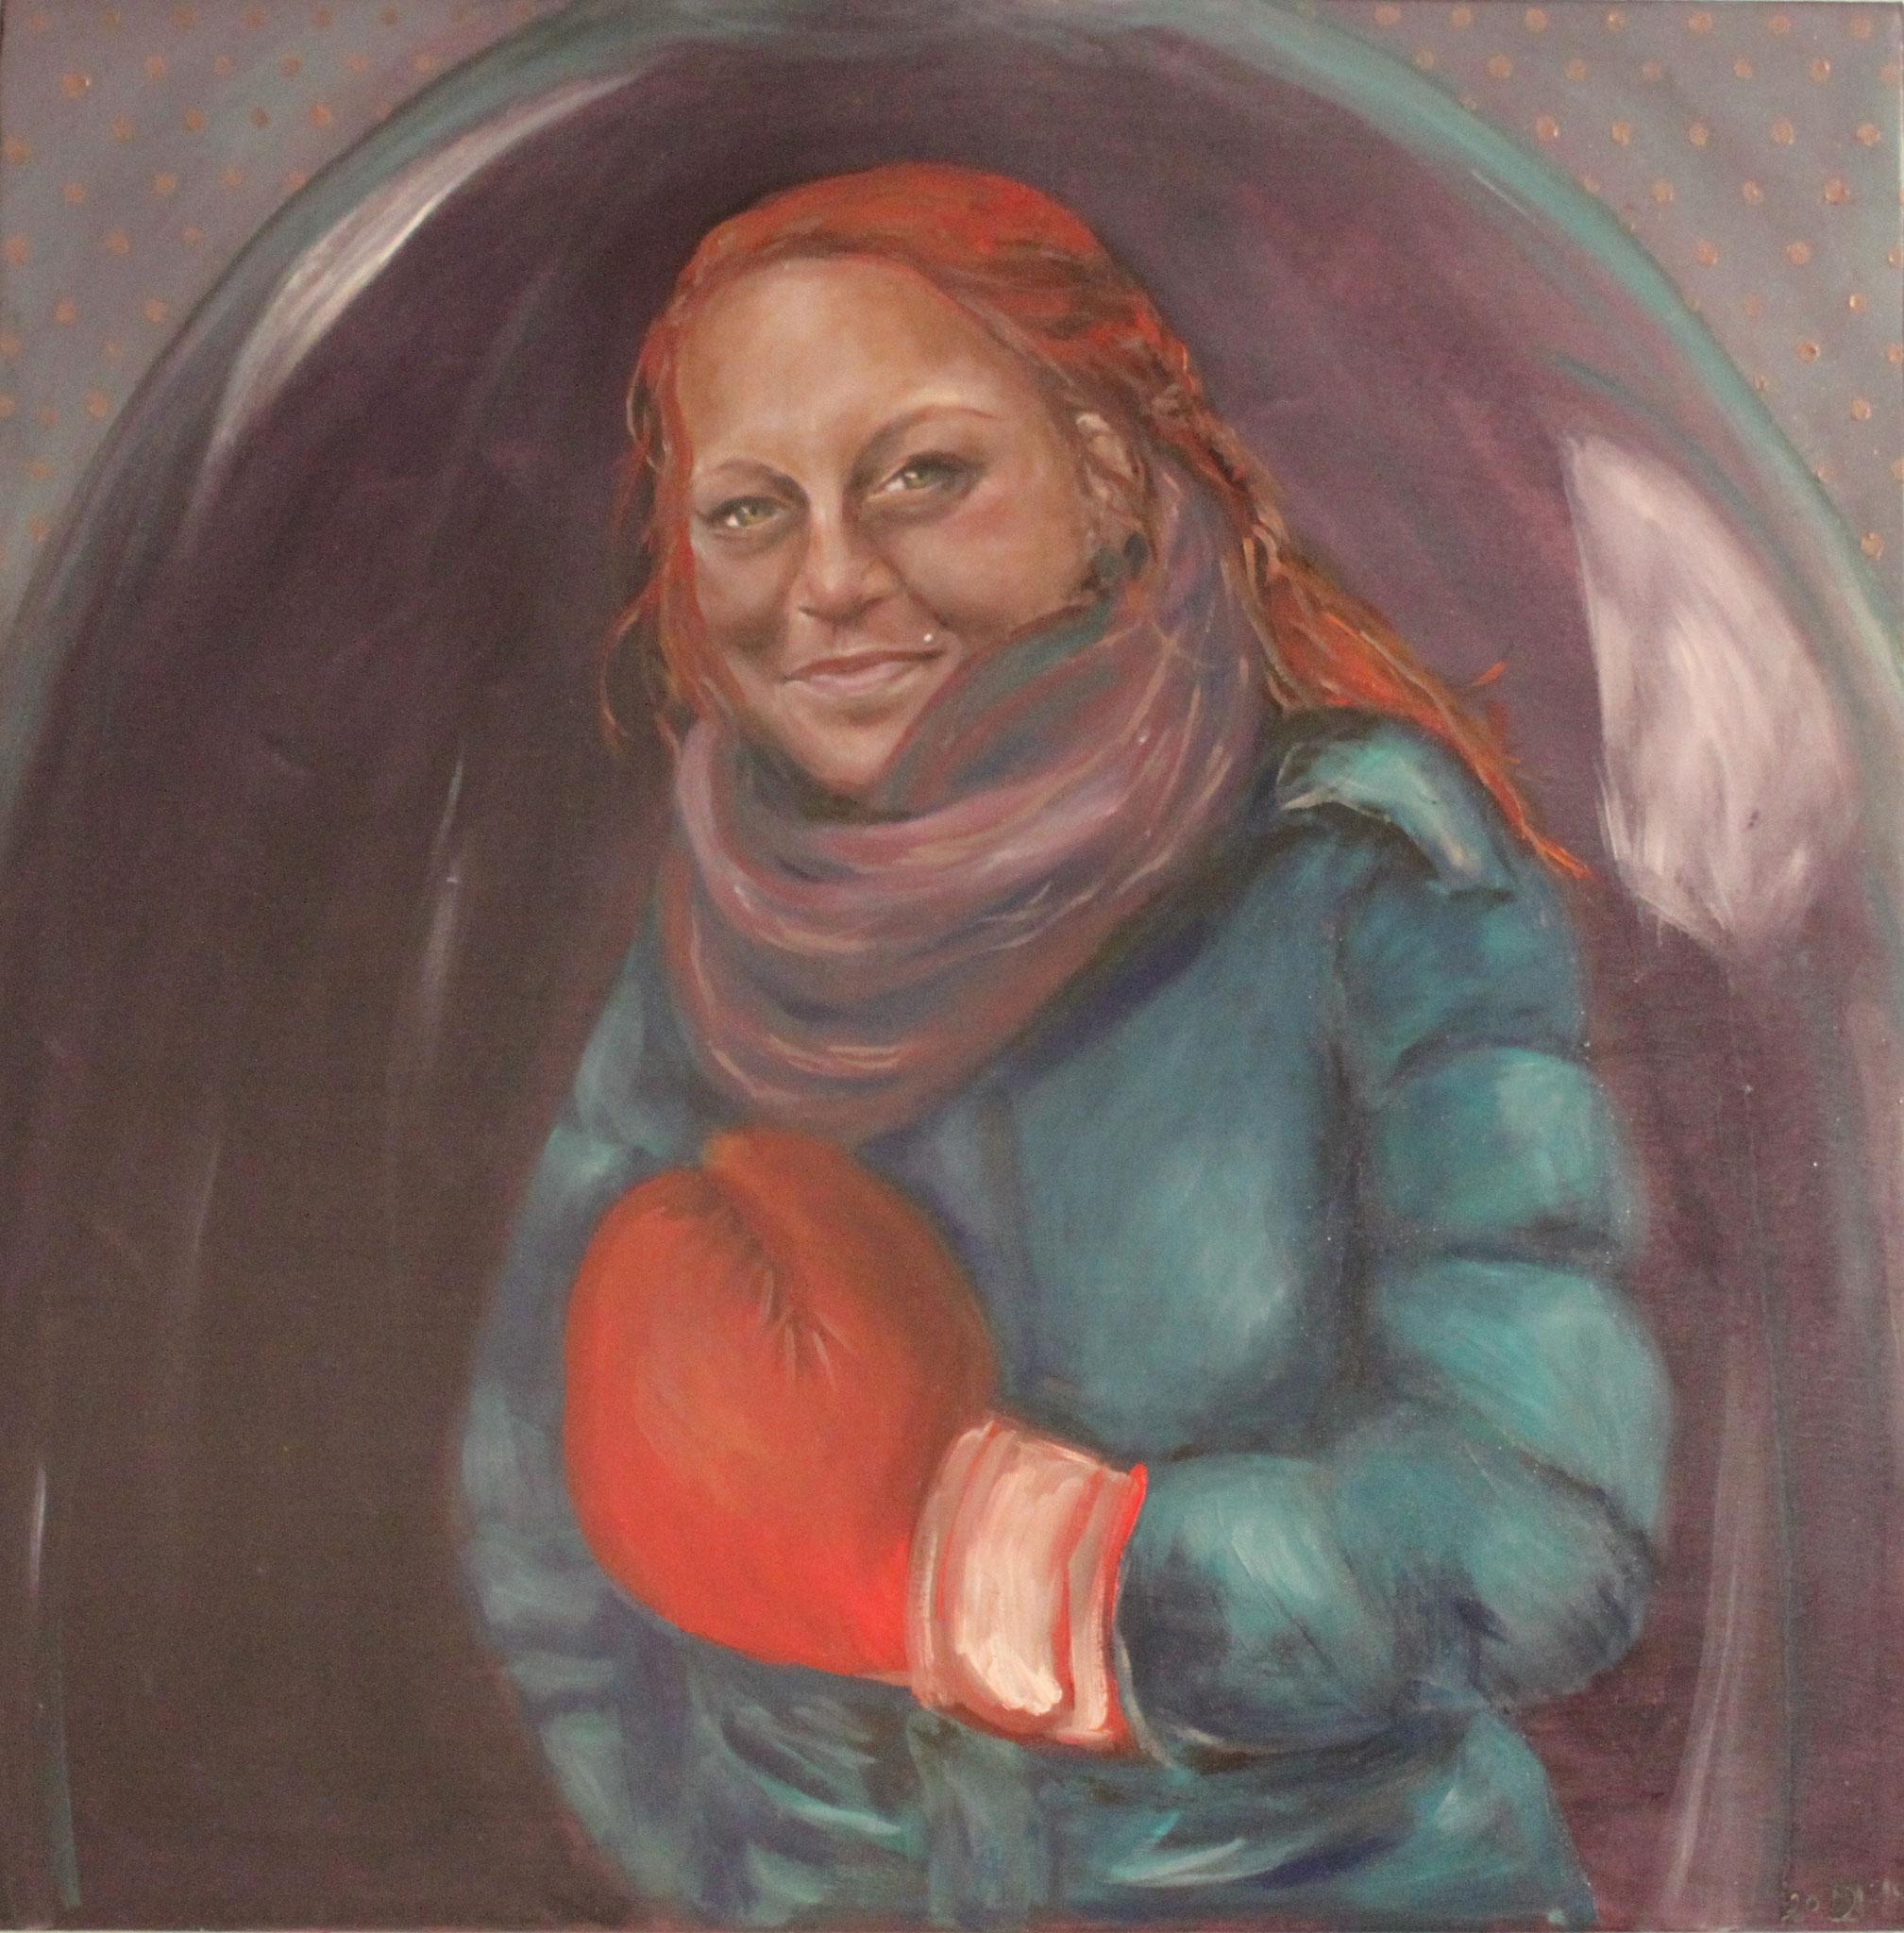 Melissa, 2018, Öl auf Leinwand, 80 cm x 80 cm x 4 cm